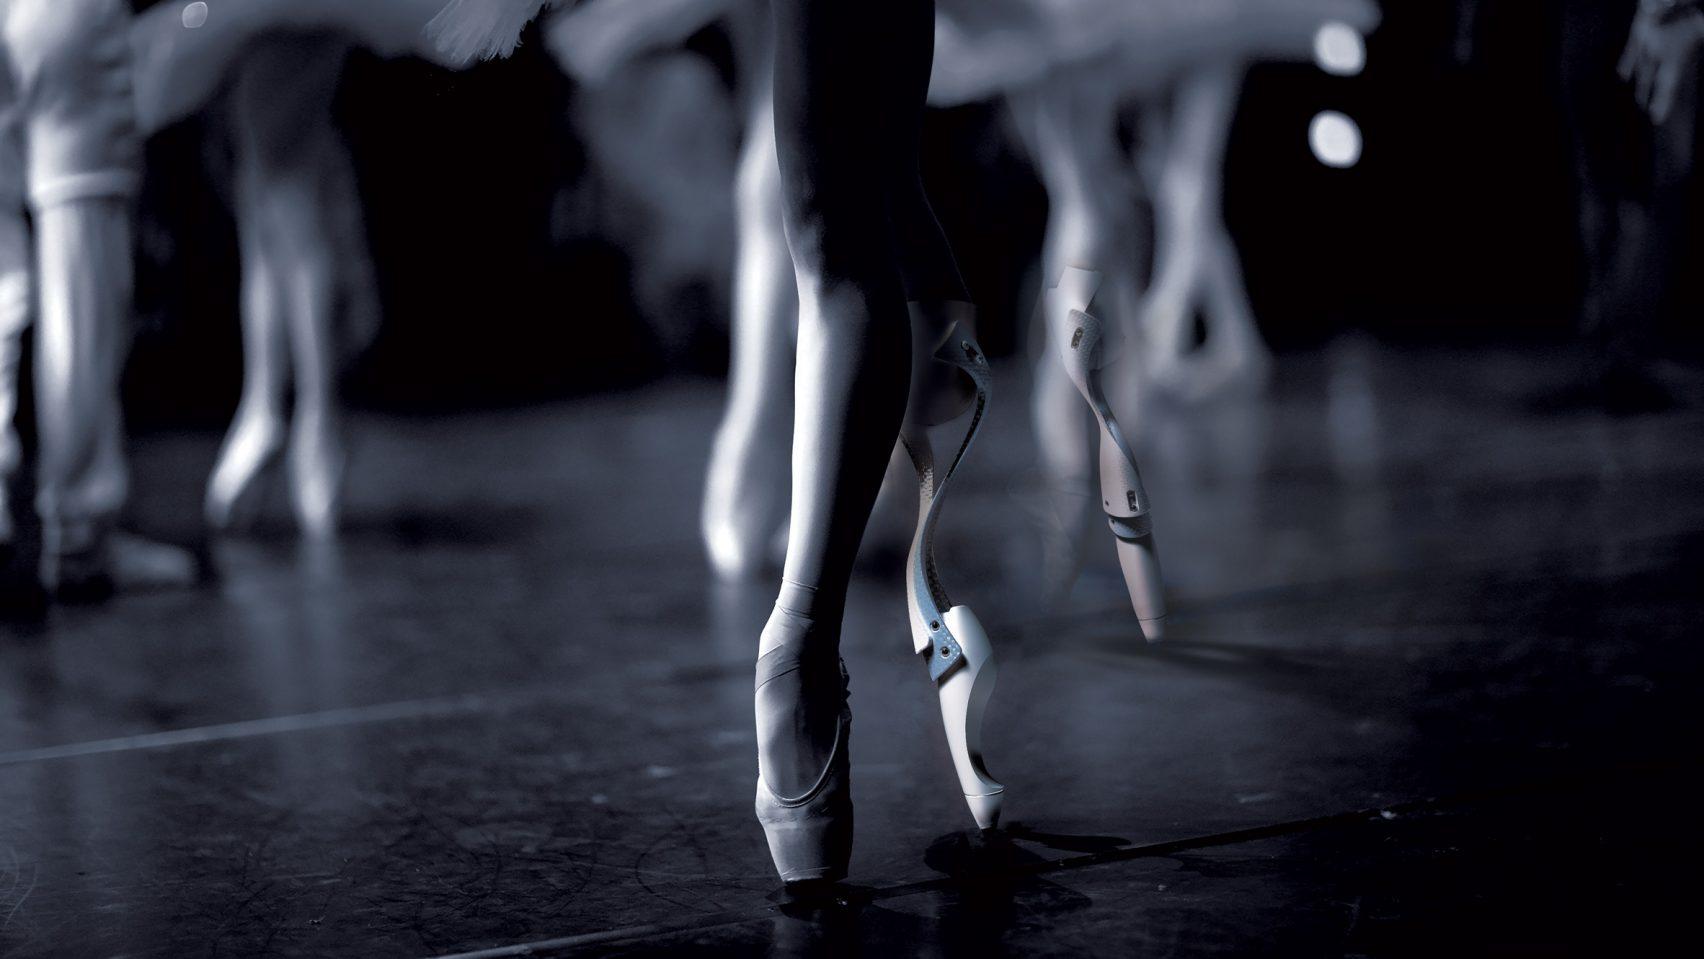 prosthetic-ballet-leg-design_dezeen_2364_hero-1-1704x959